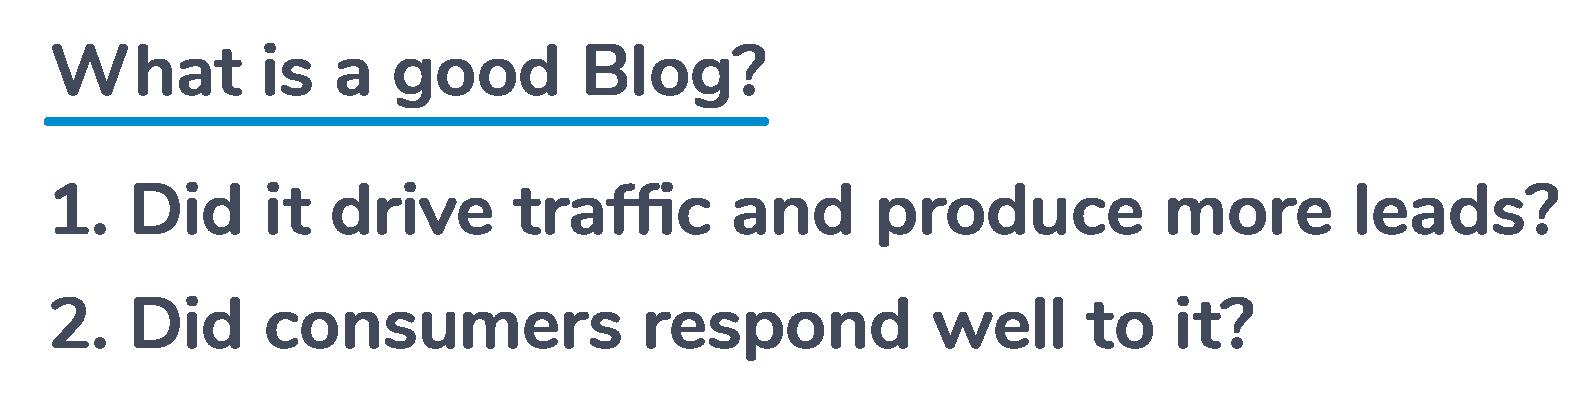 What makes a good blog